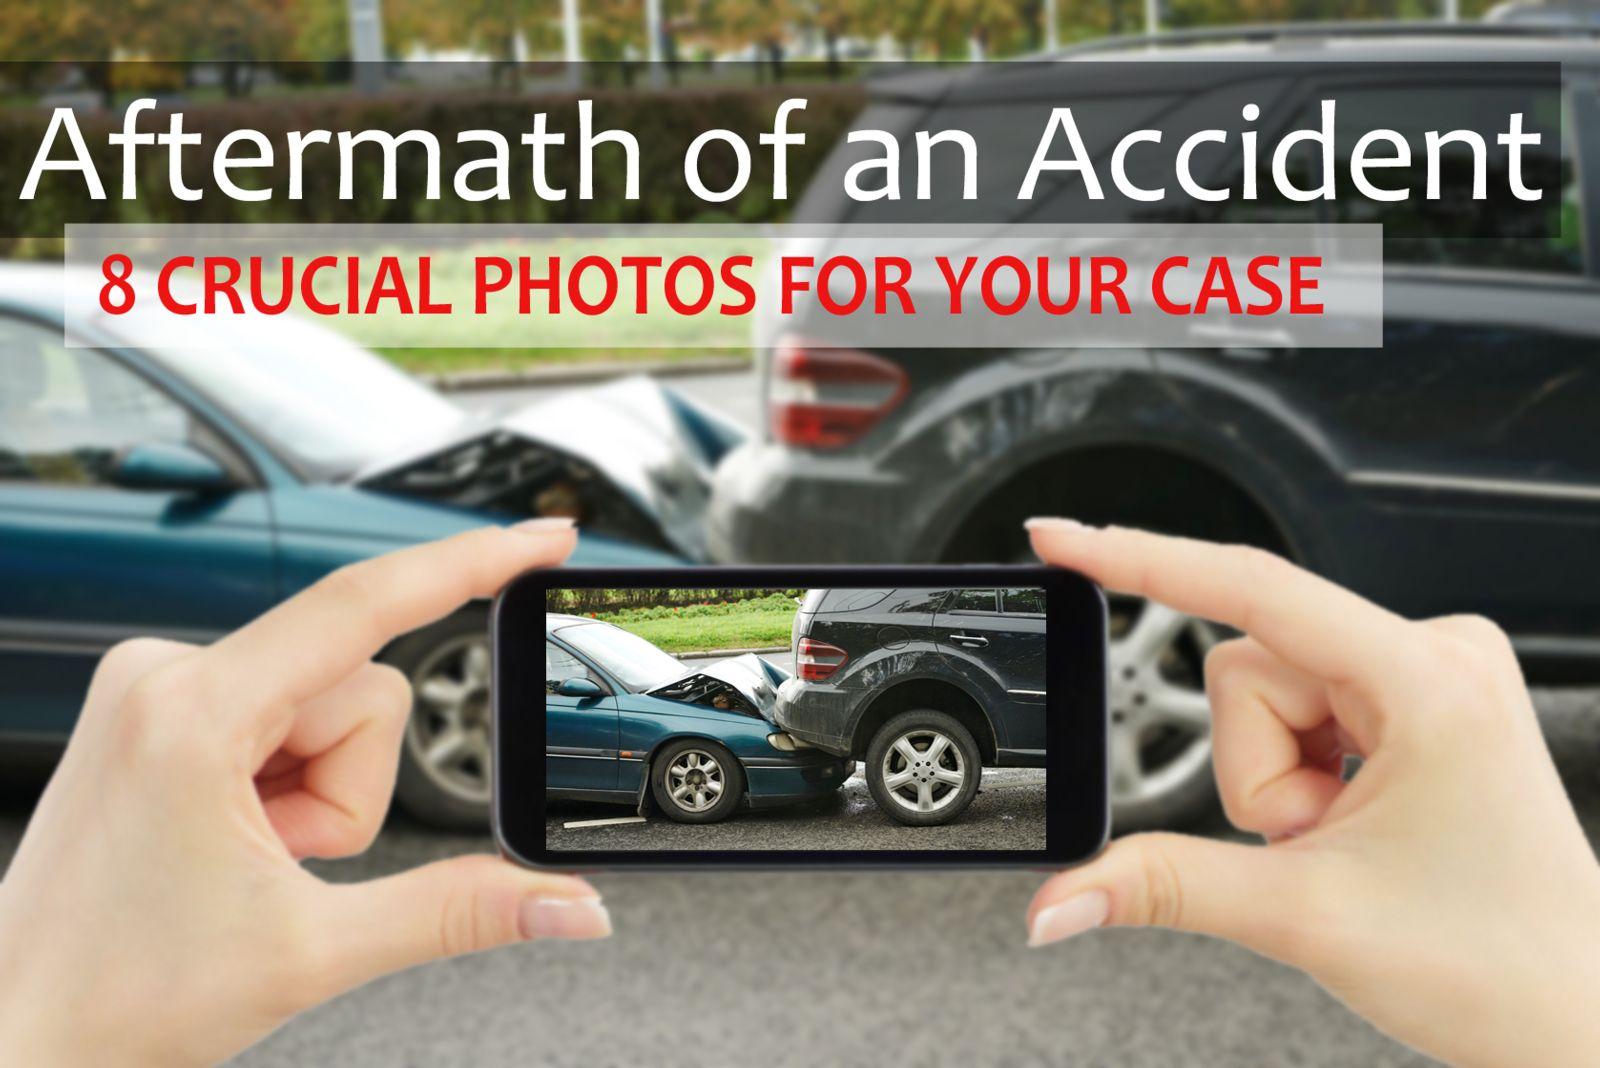 Photos after an accident